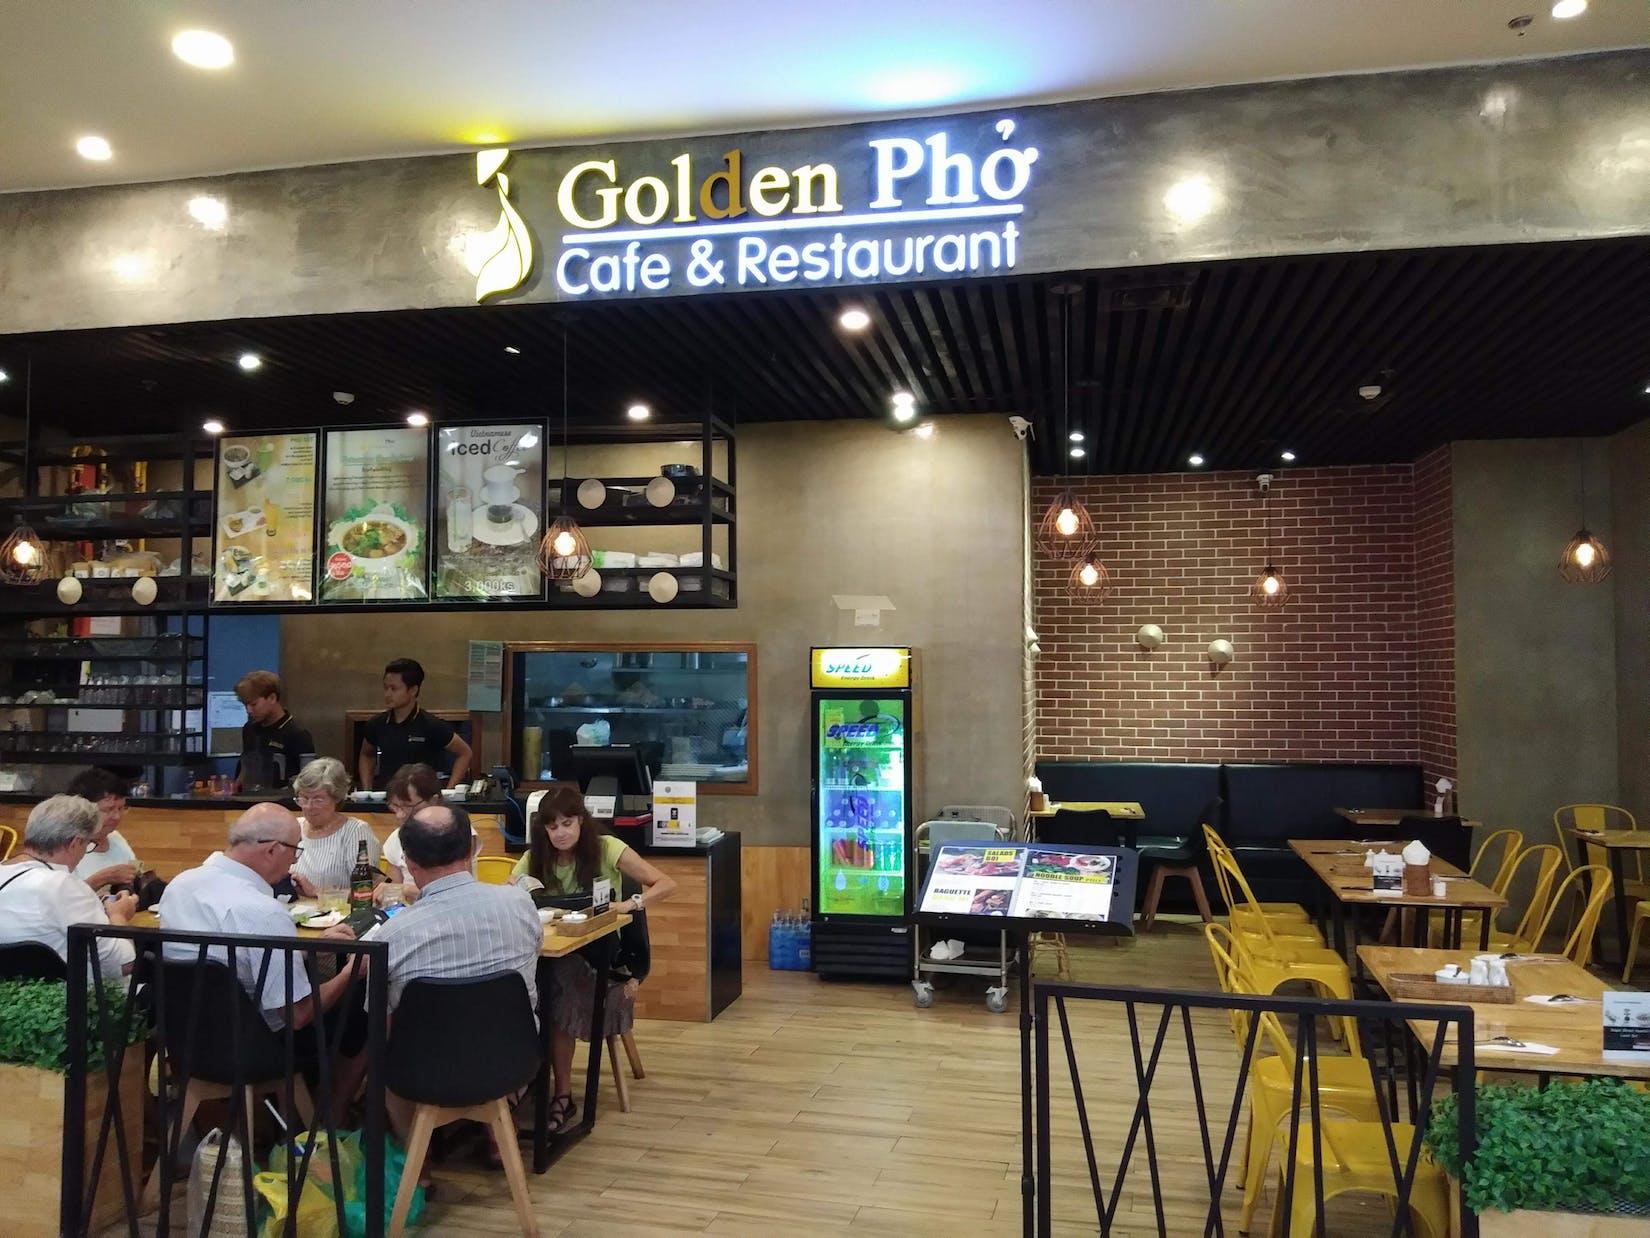 Golden Pho Cafe & Restaurant | yathar